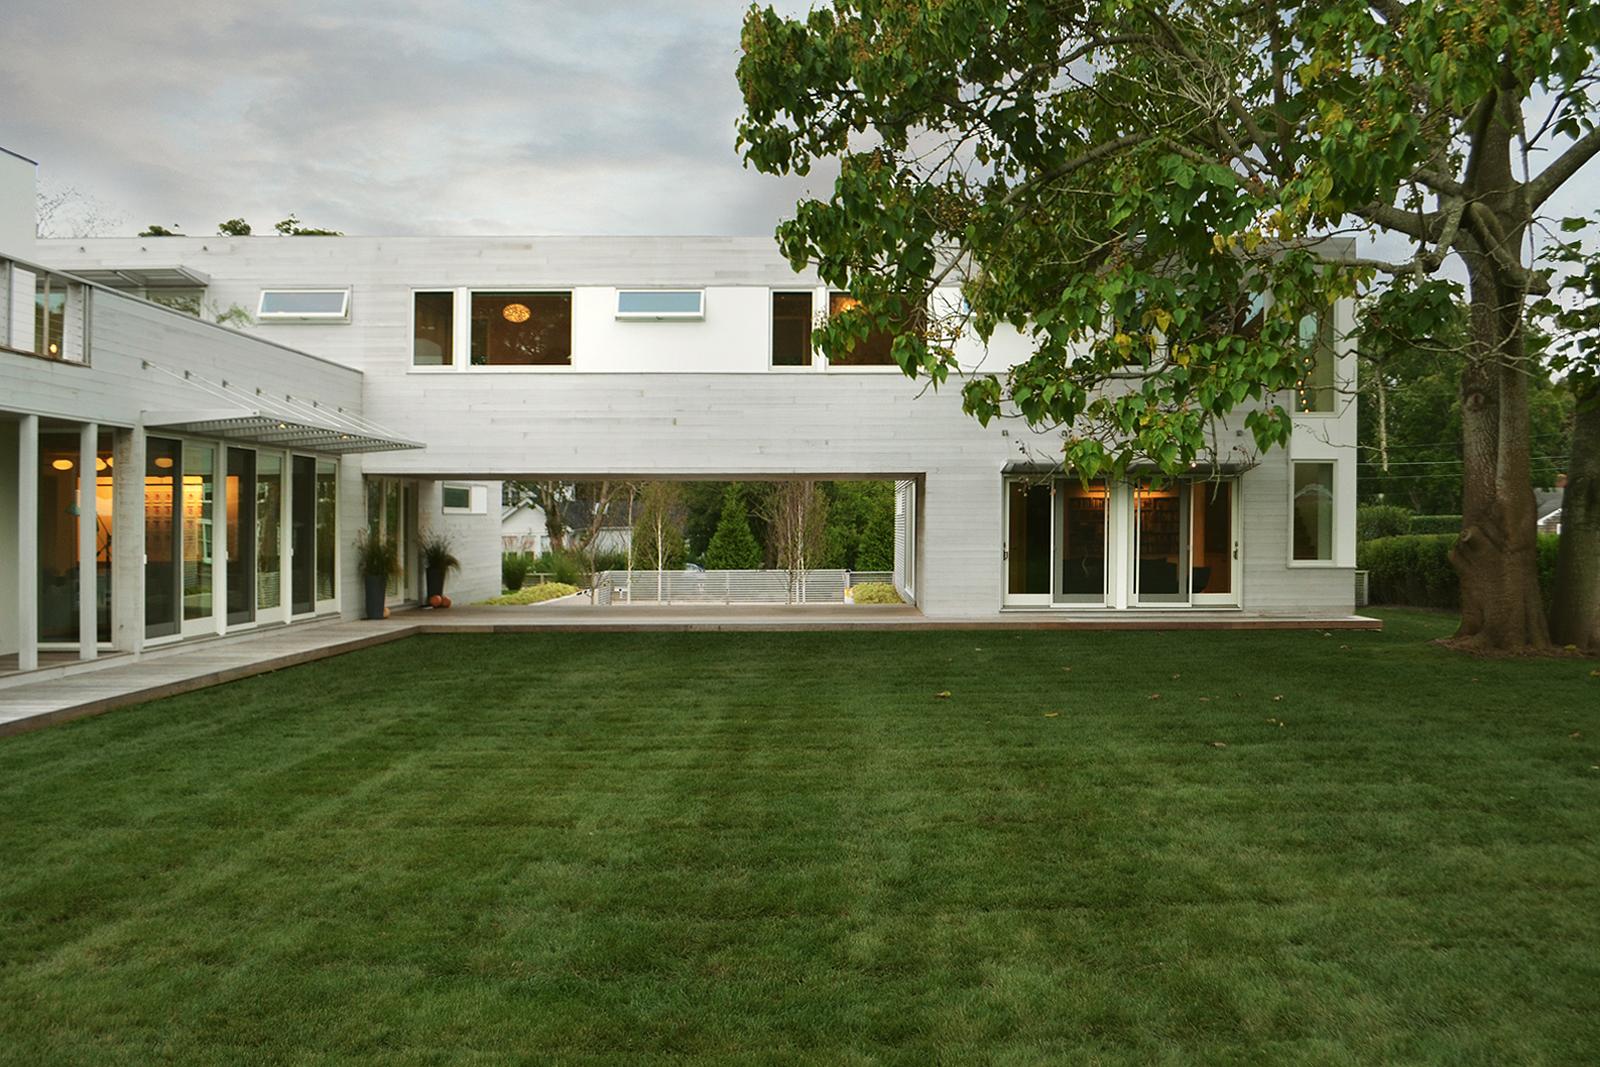 23-re4a-resolution-4-architecture-modern-modular-prefab-bridgehampton house-exterior-dusk.jpg